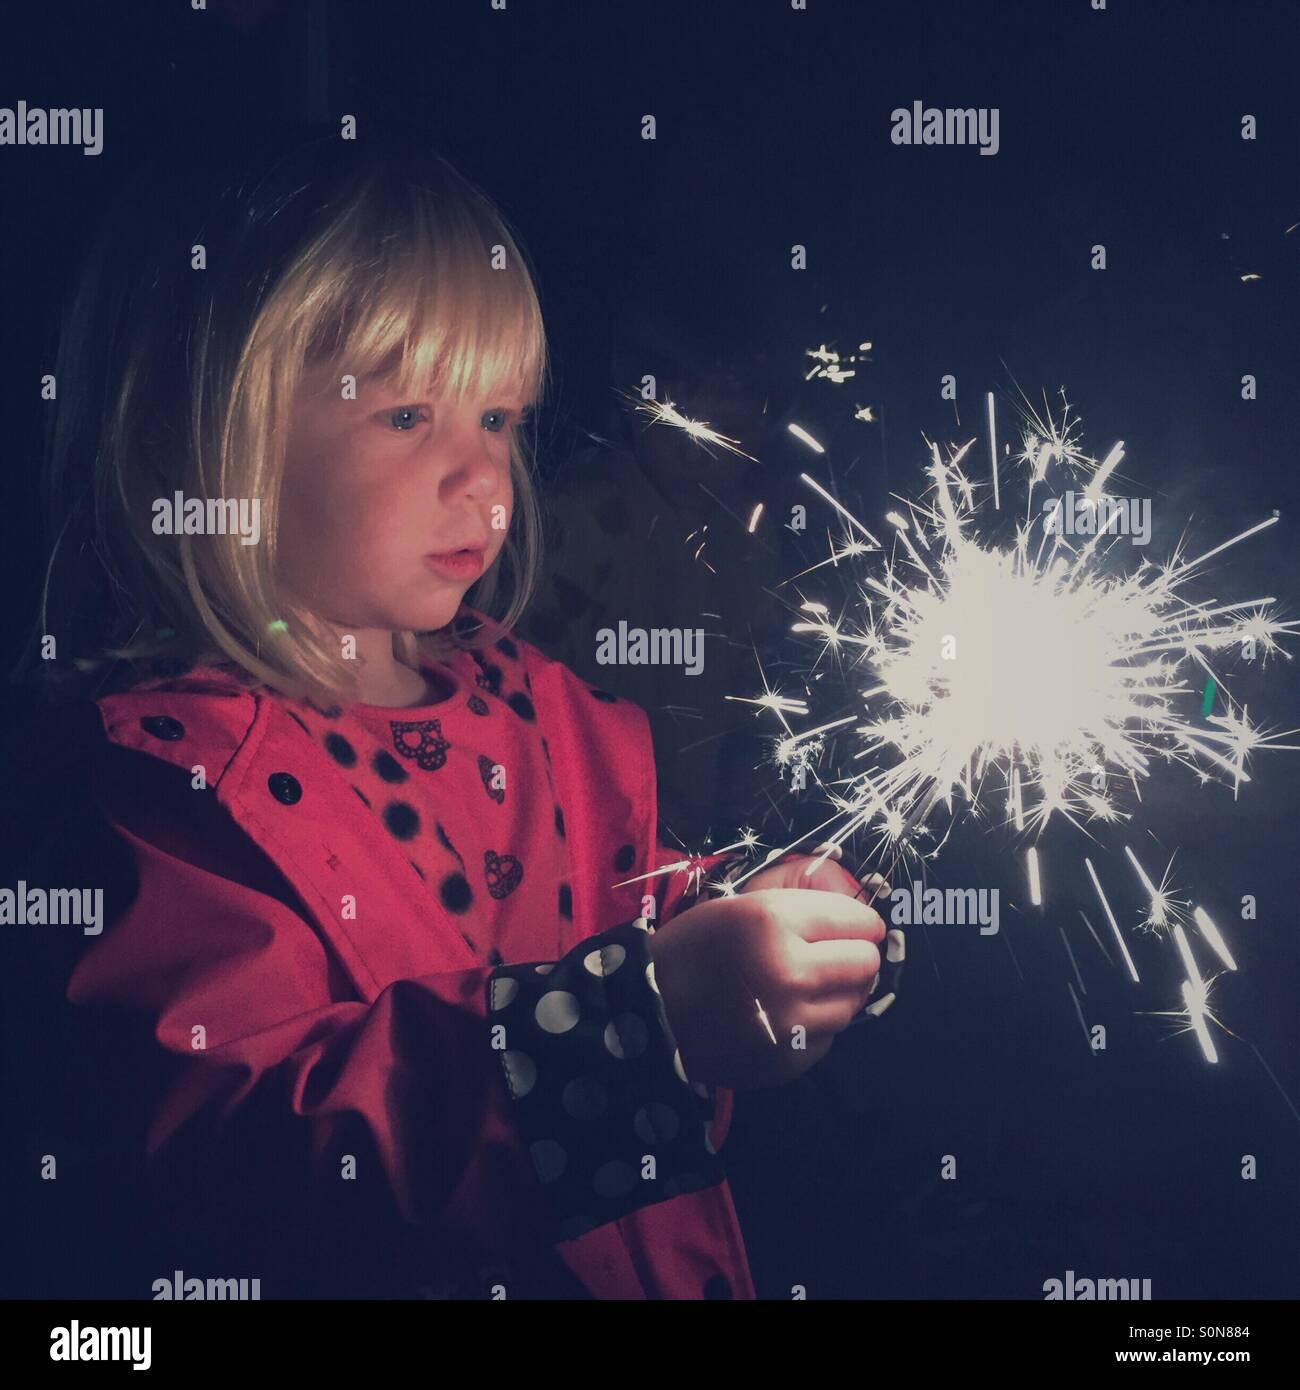 Joven rubia chica caucásica mira fijamente como una bengala sostiene ilumina su rostro. Imagen De Stock